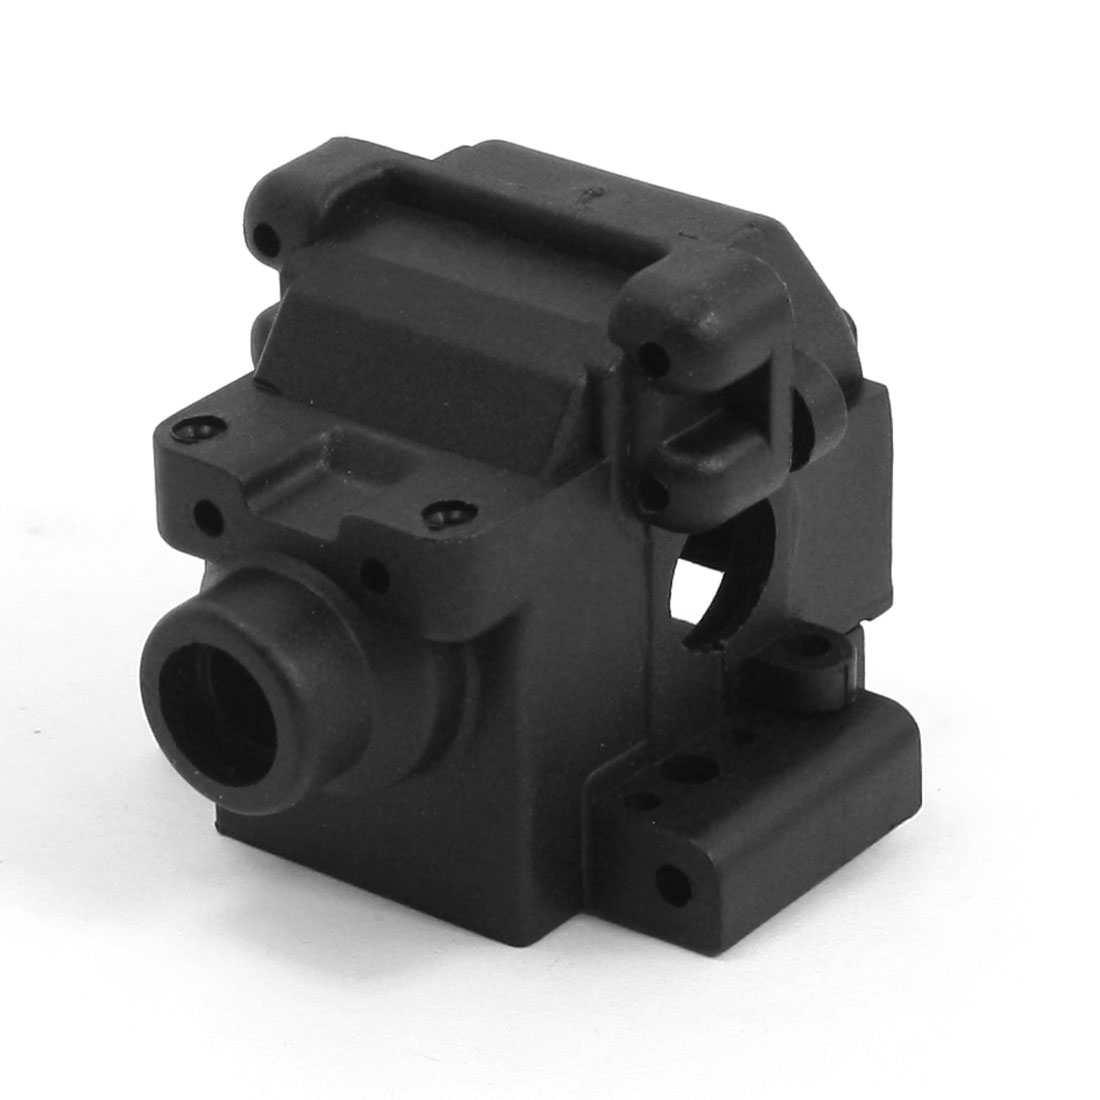 06046 Plastic Rear Gear Box Housing for 94122/94188 1/10 RC Model Car